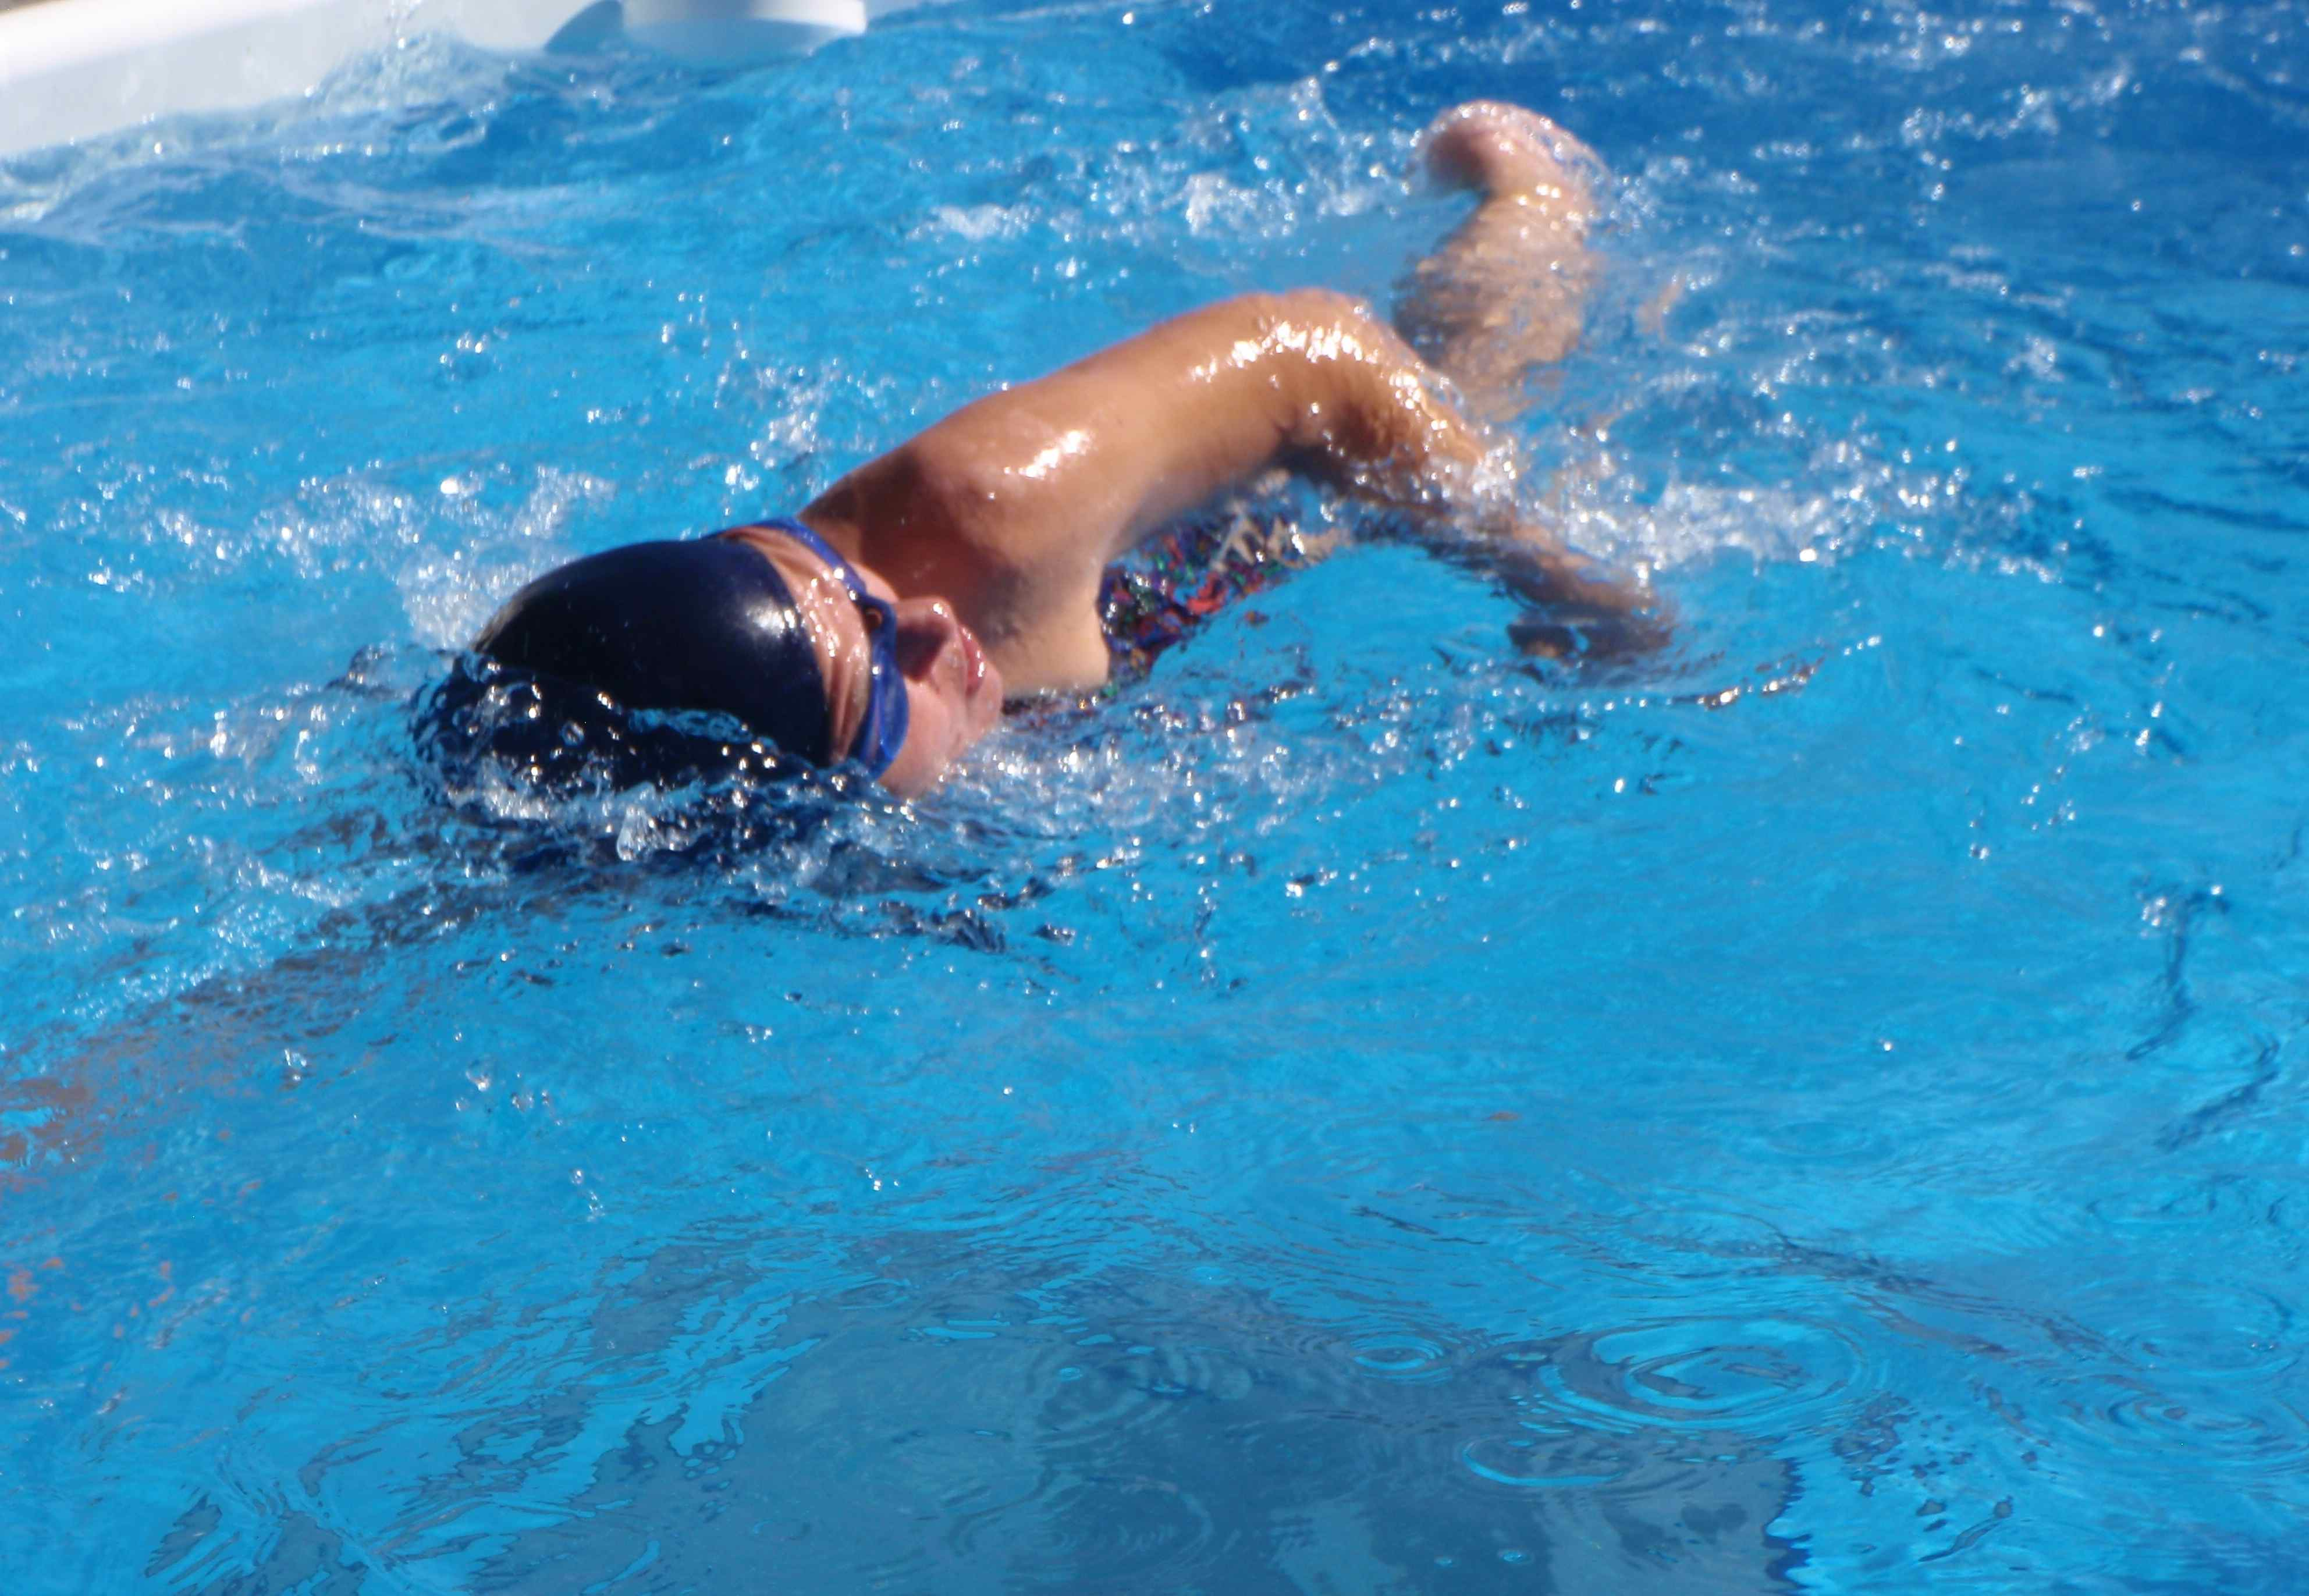 swim-spa-size-against-current